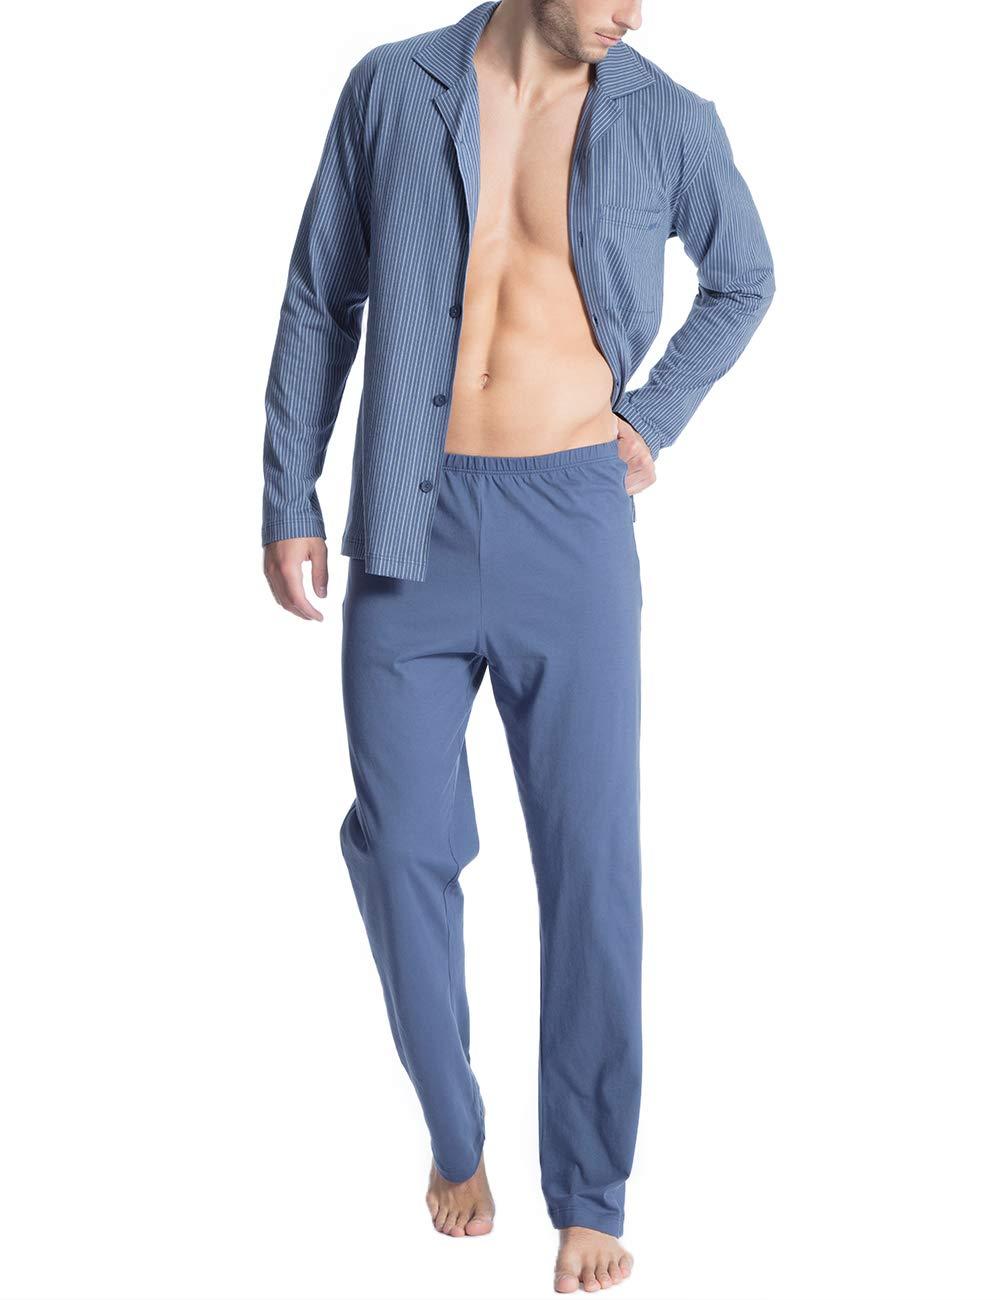 Blue Homme Relax Ensemble De Imprint PyjamaBleumountain 1 448Large Calida g6Yb7yvf